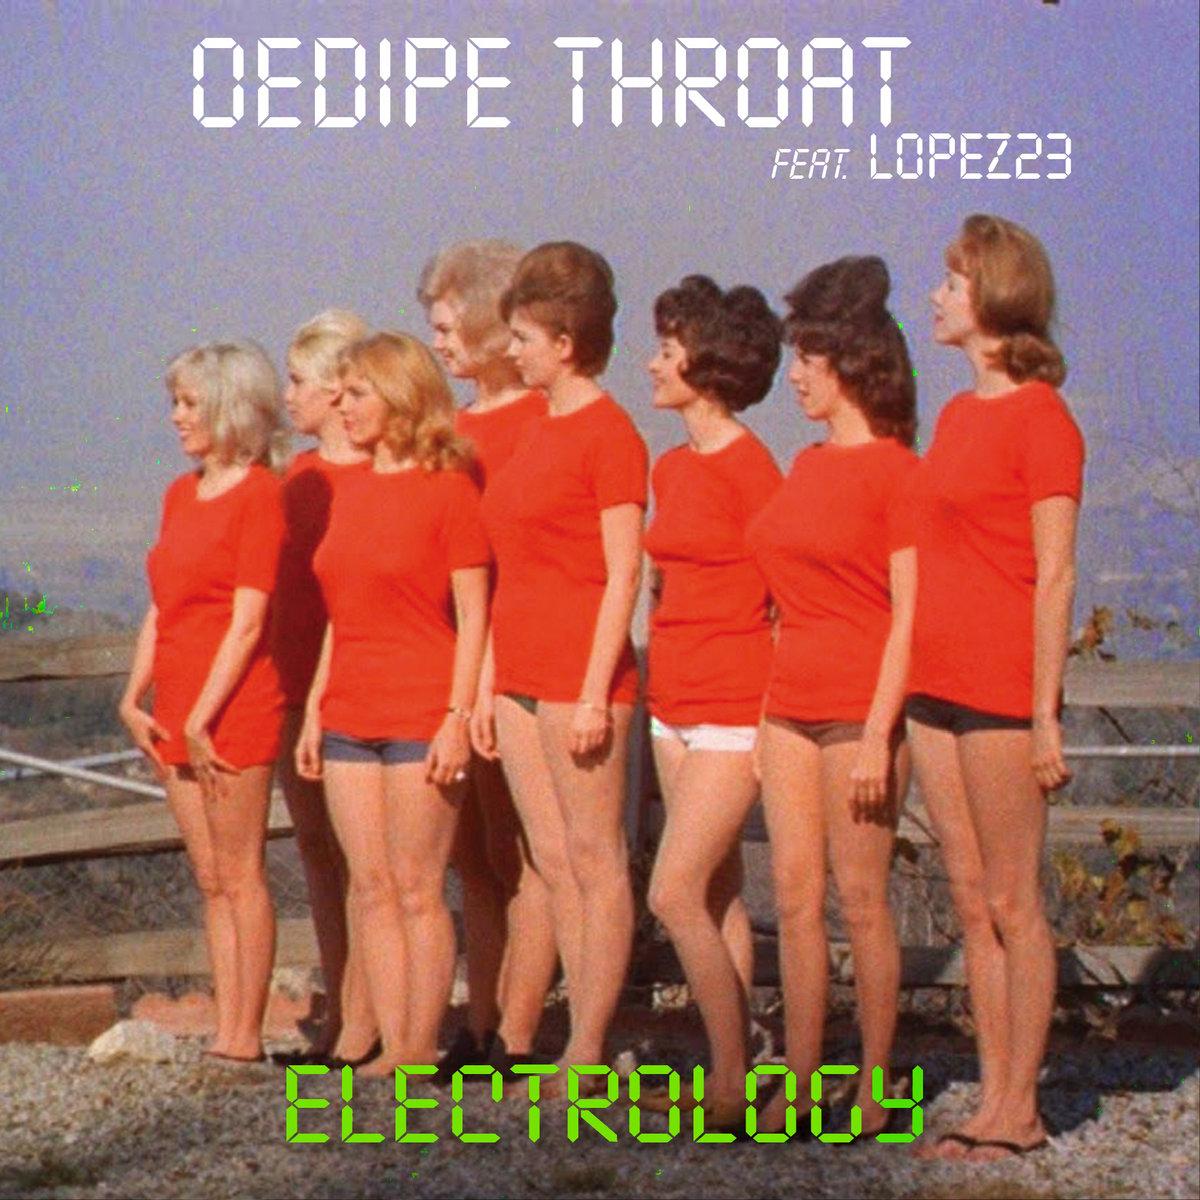 ELECTROLOGY